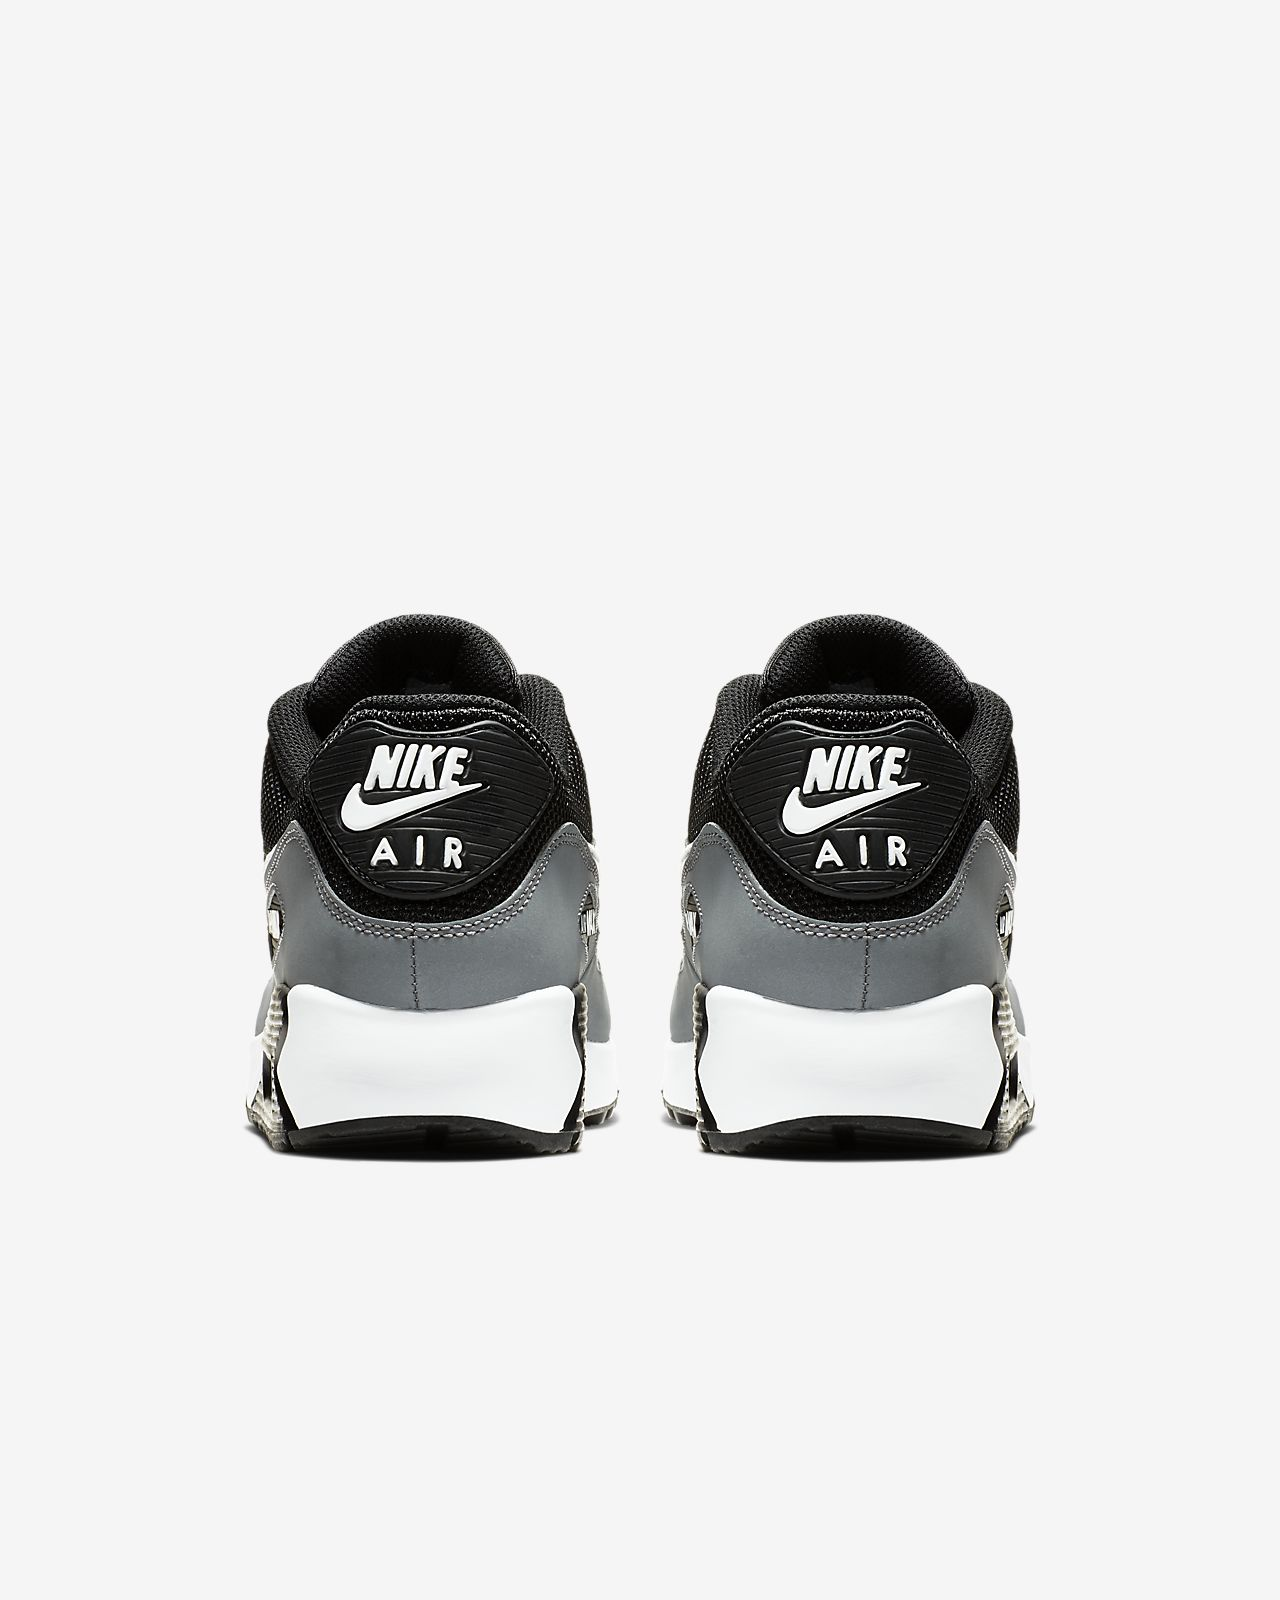 separation shoes 68dbc 2be40 ... Nike Air Max 90 Essential Men s Shoe